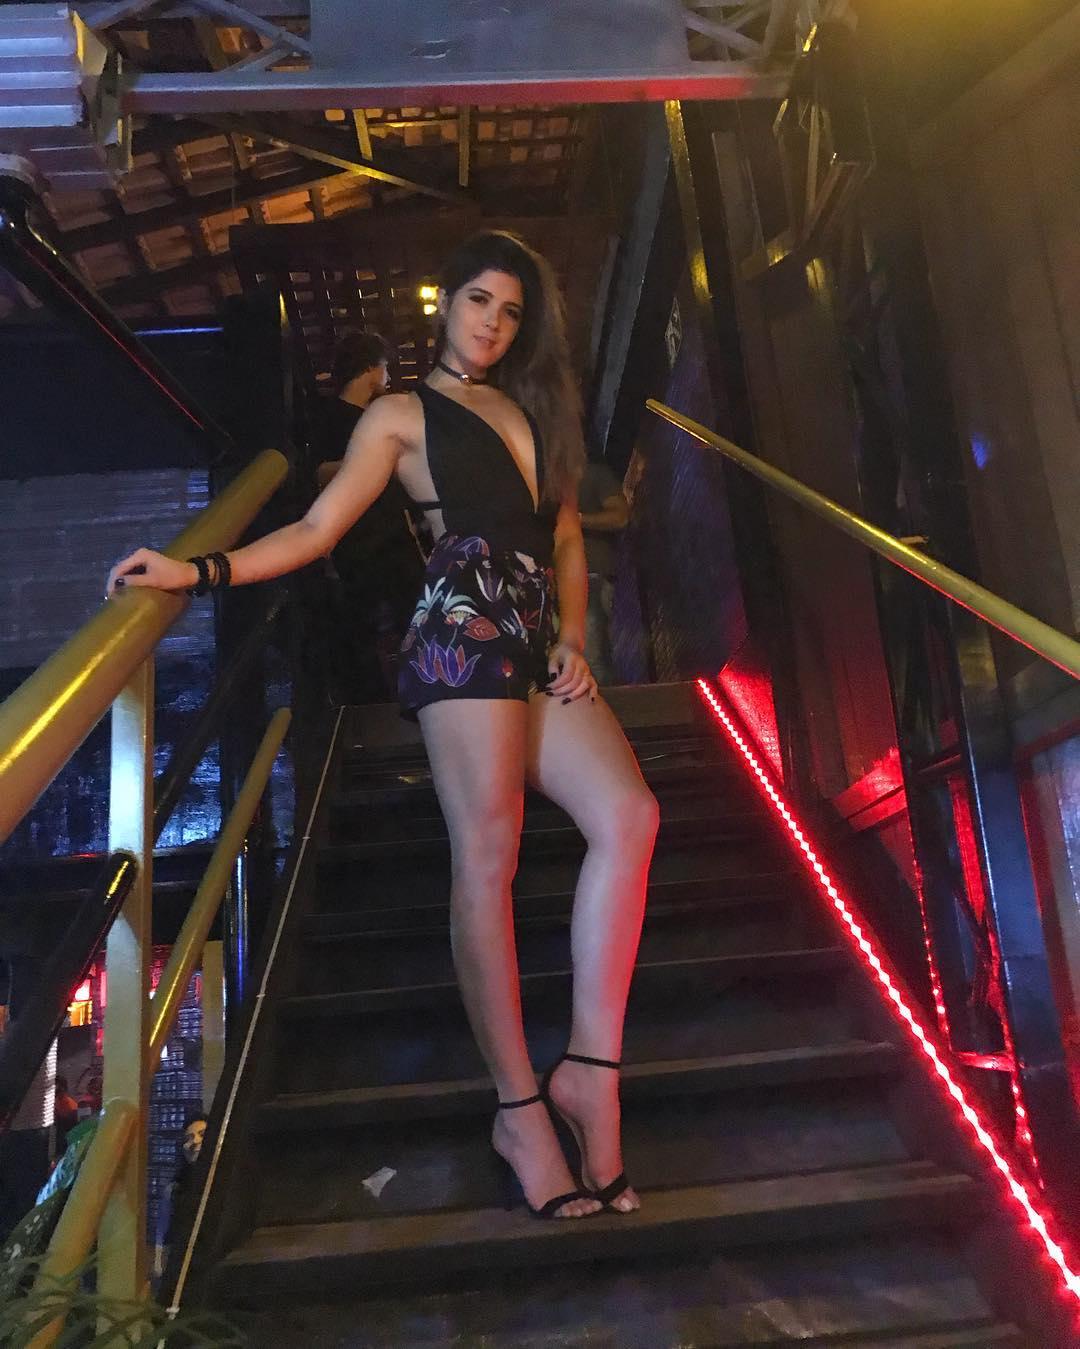 julianne zague, miss maranhao empresarial 2018. - Página 2 36539211